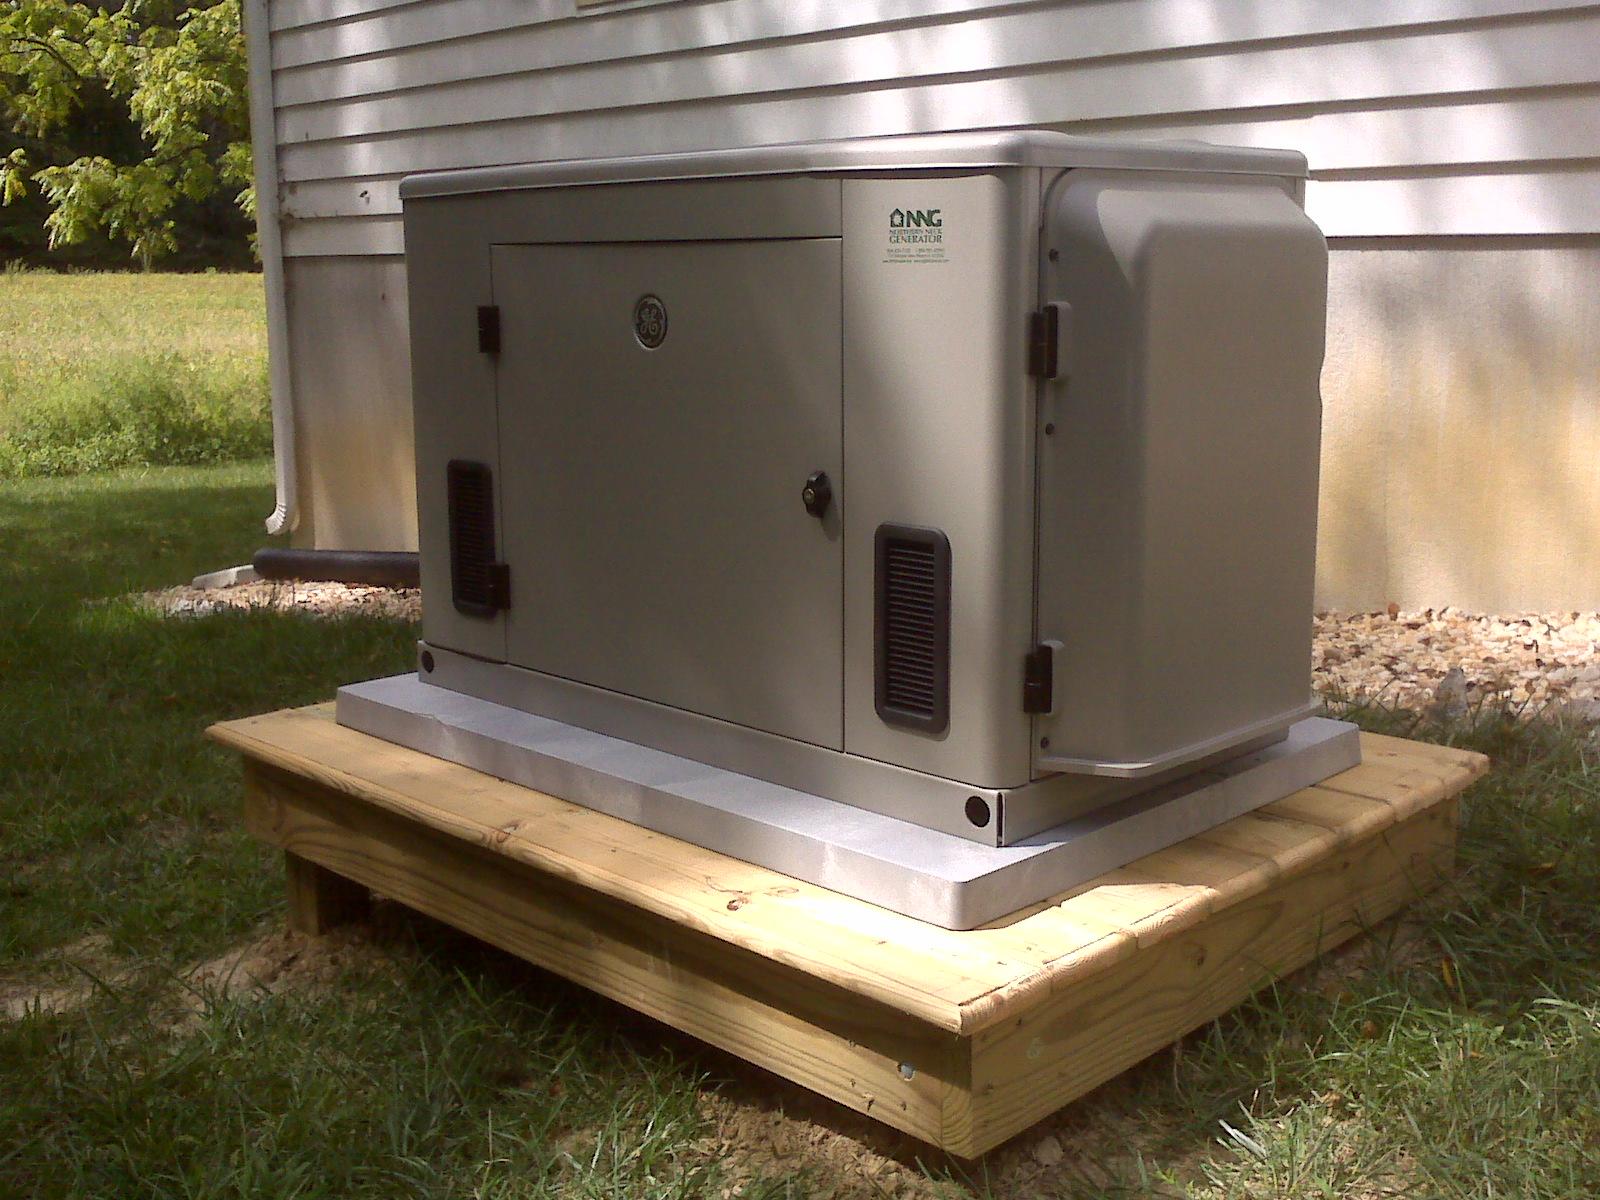 ge 20 kilowatt air cooled residential generator on custom platform